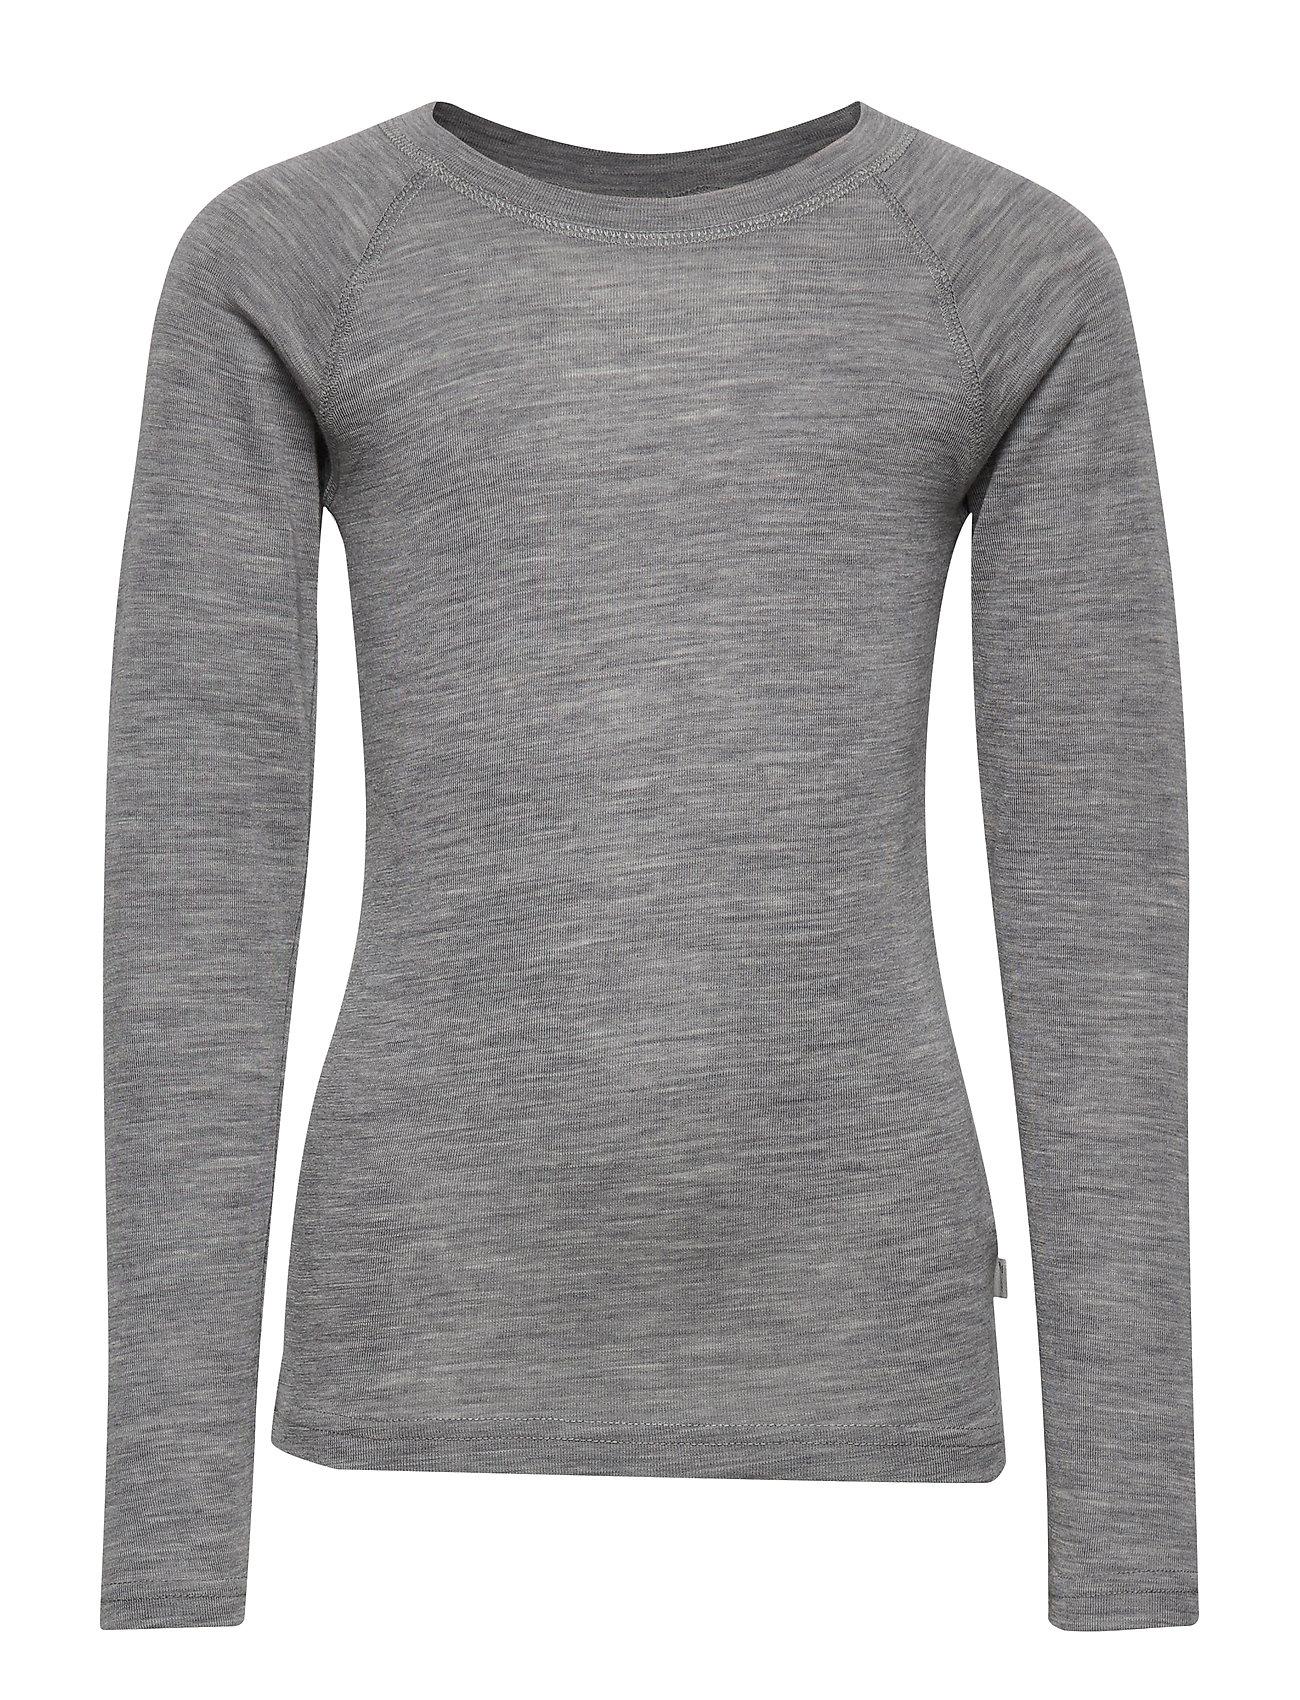 Wheat Wool T-Shirt LS - MELANGE GREY